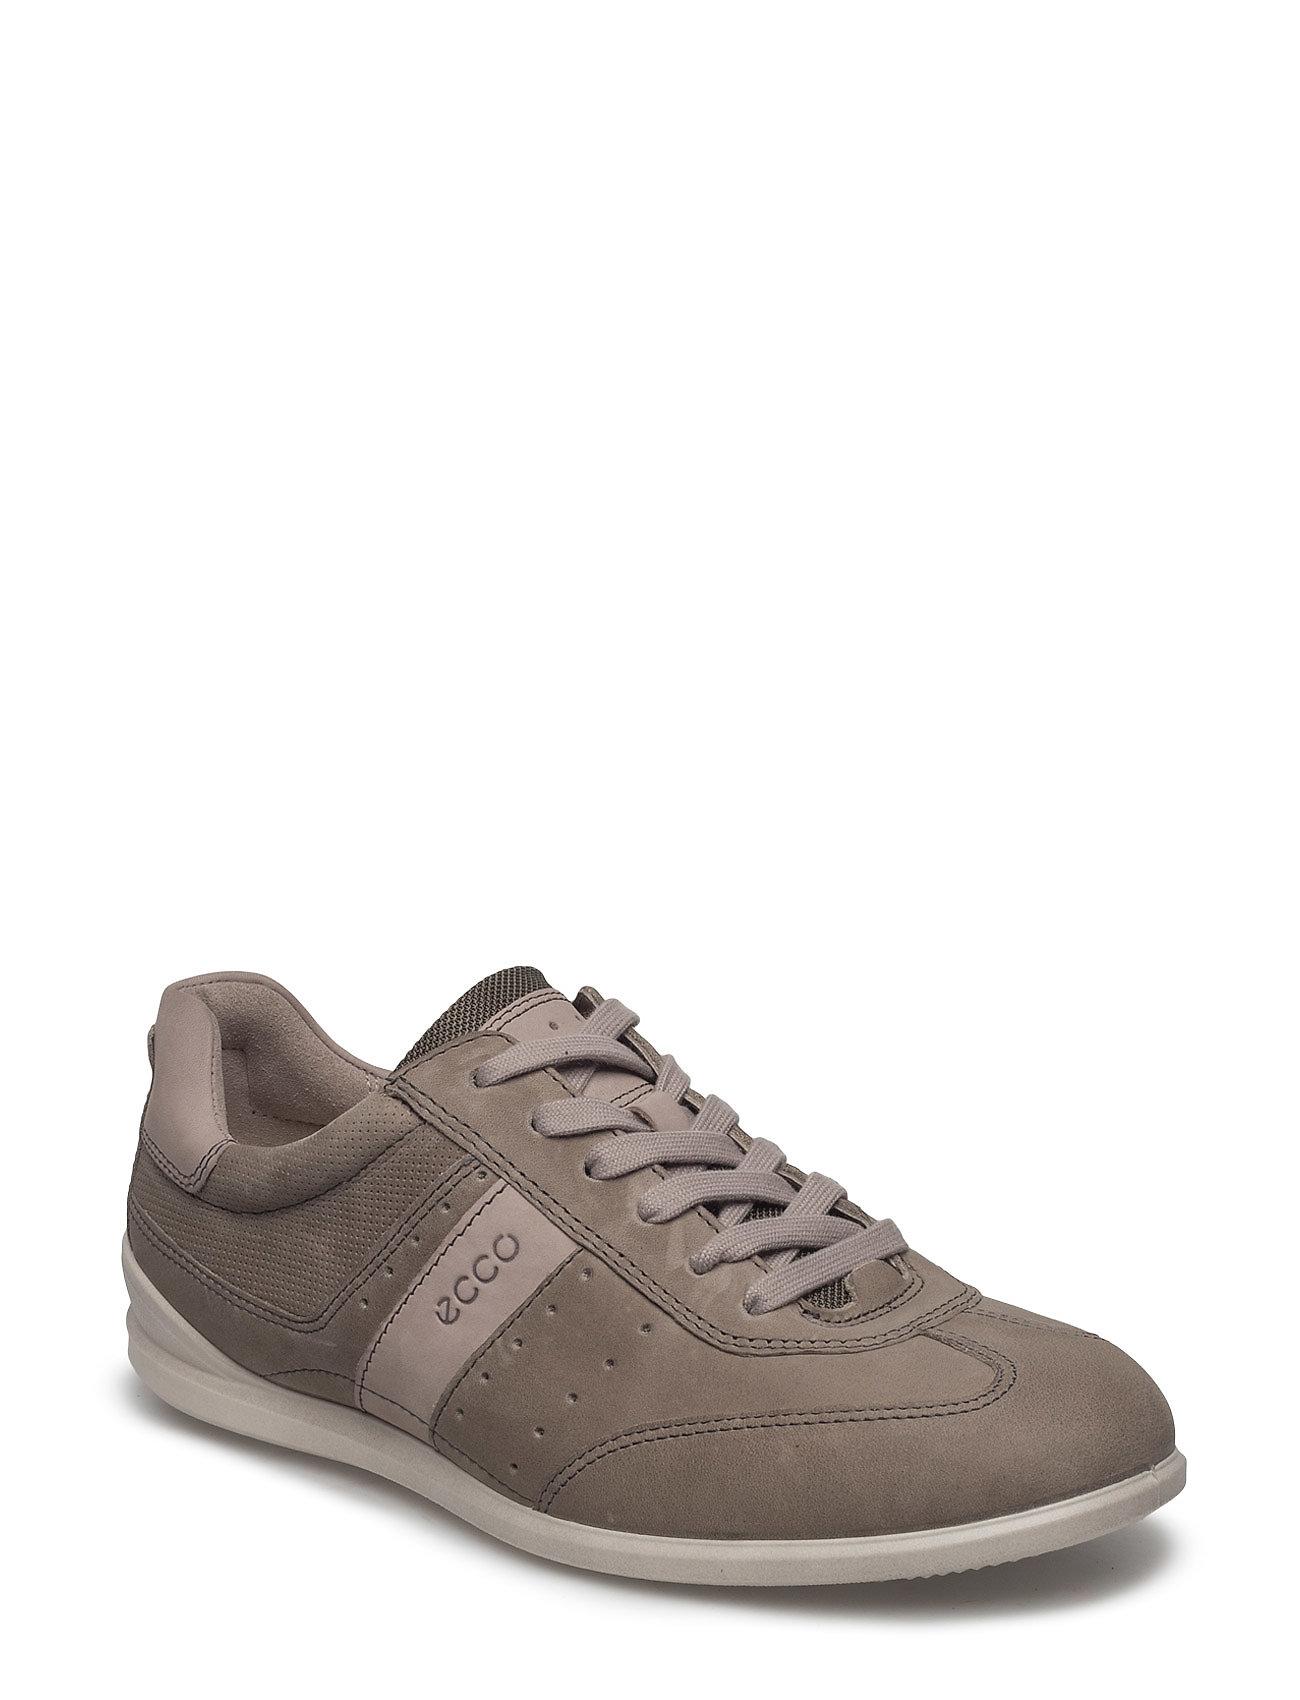 Chander ECCO Sneakers til Herrer i